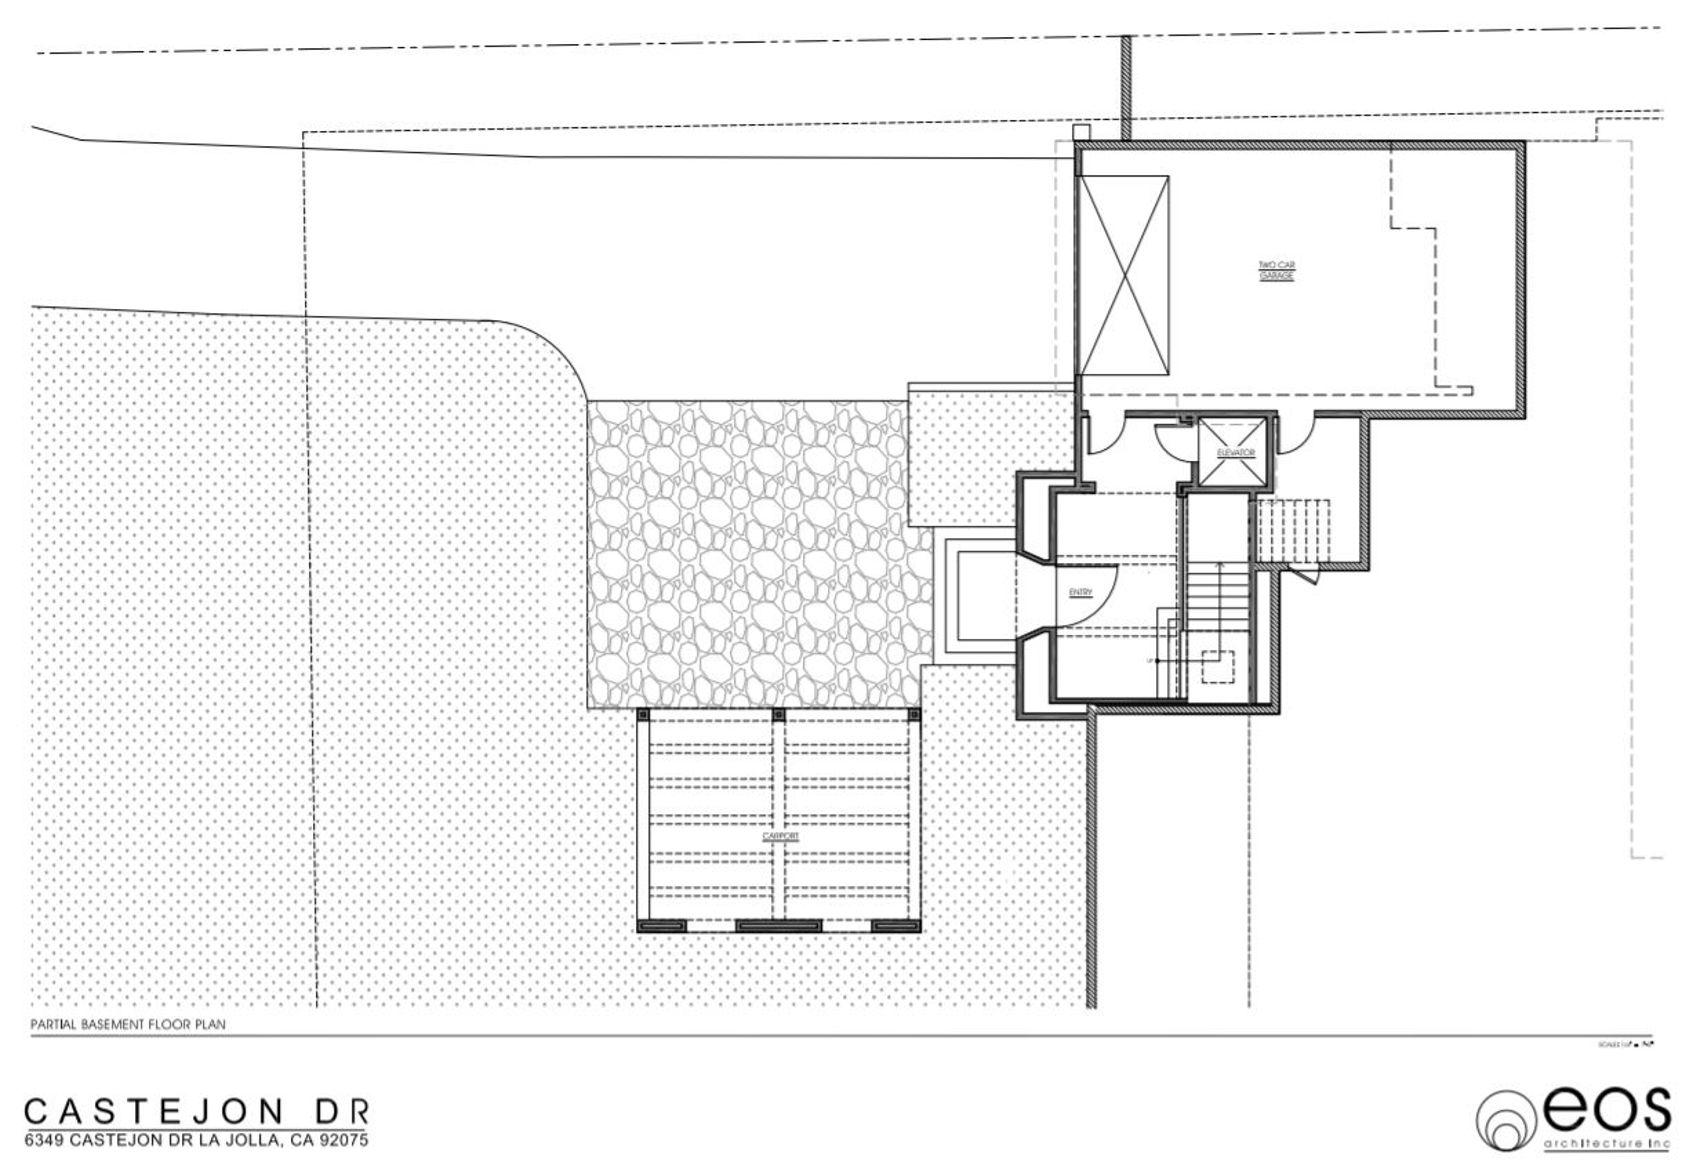 Entry Level - Garage - Motor Court